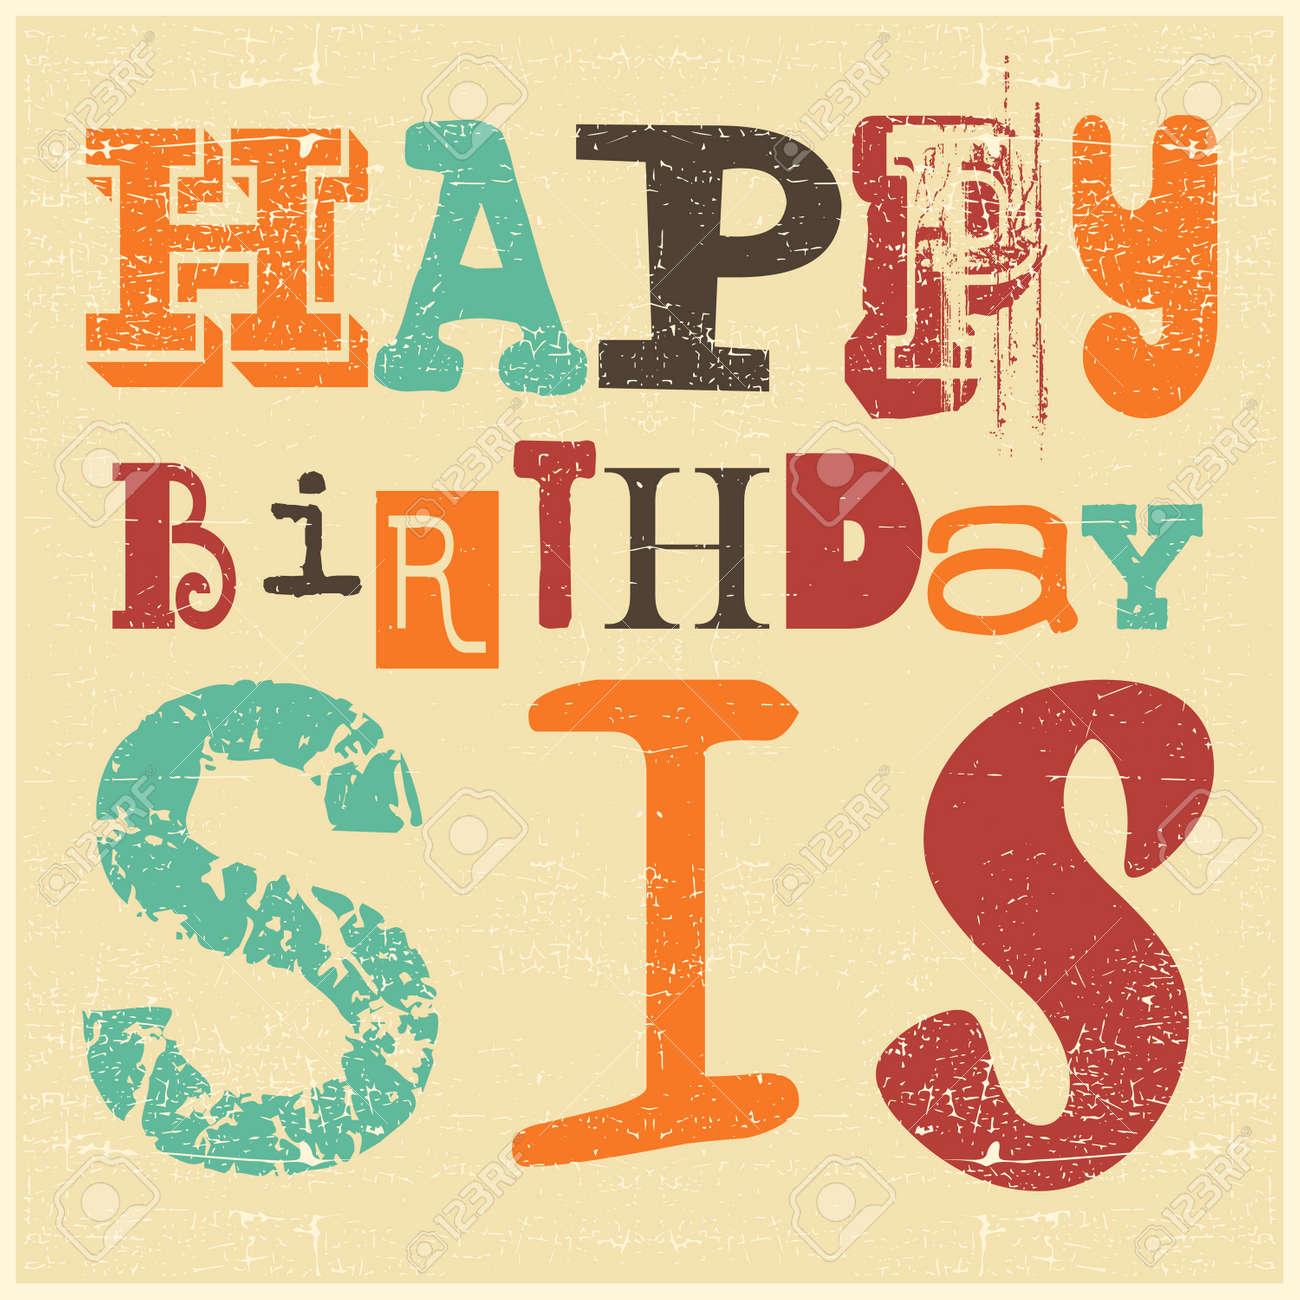 Retro Happy Birthday Card On Grunge Background Happy Birthday – Vintage Happy Birthday Cards